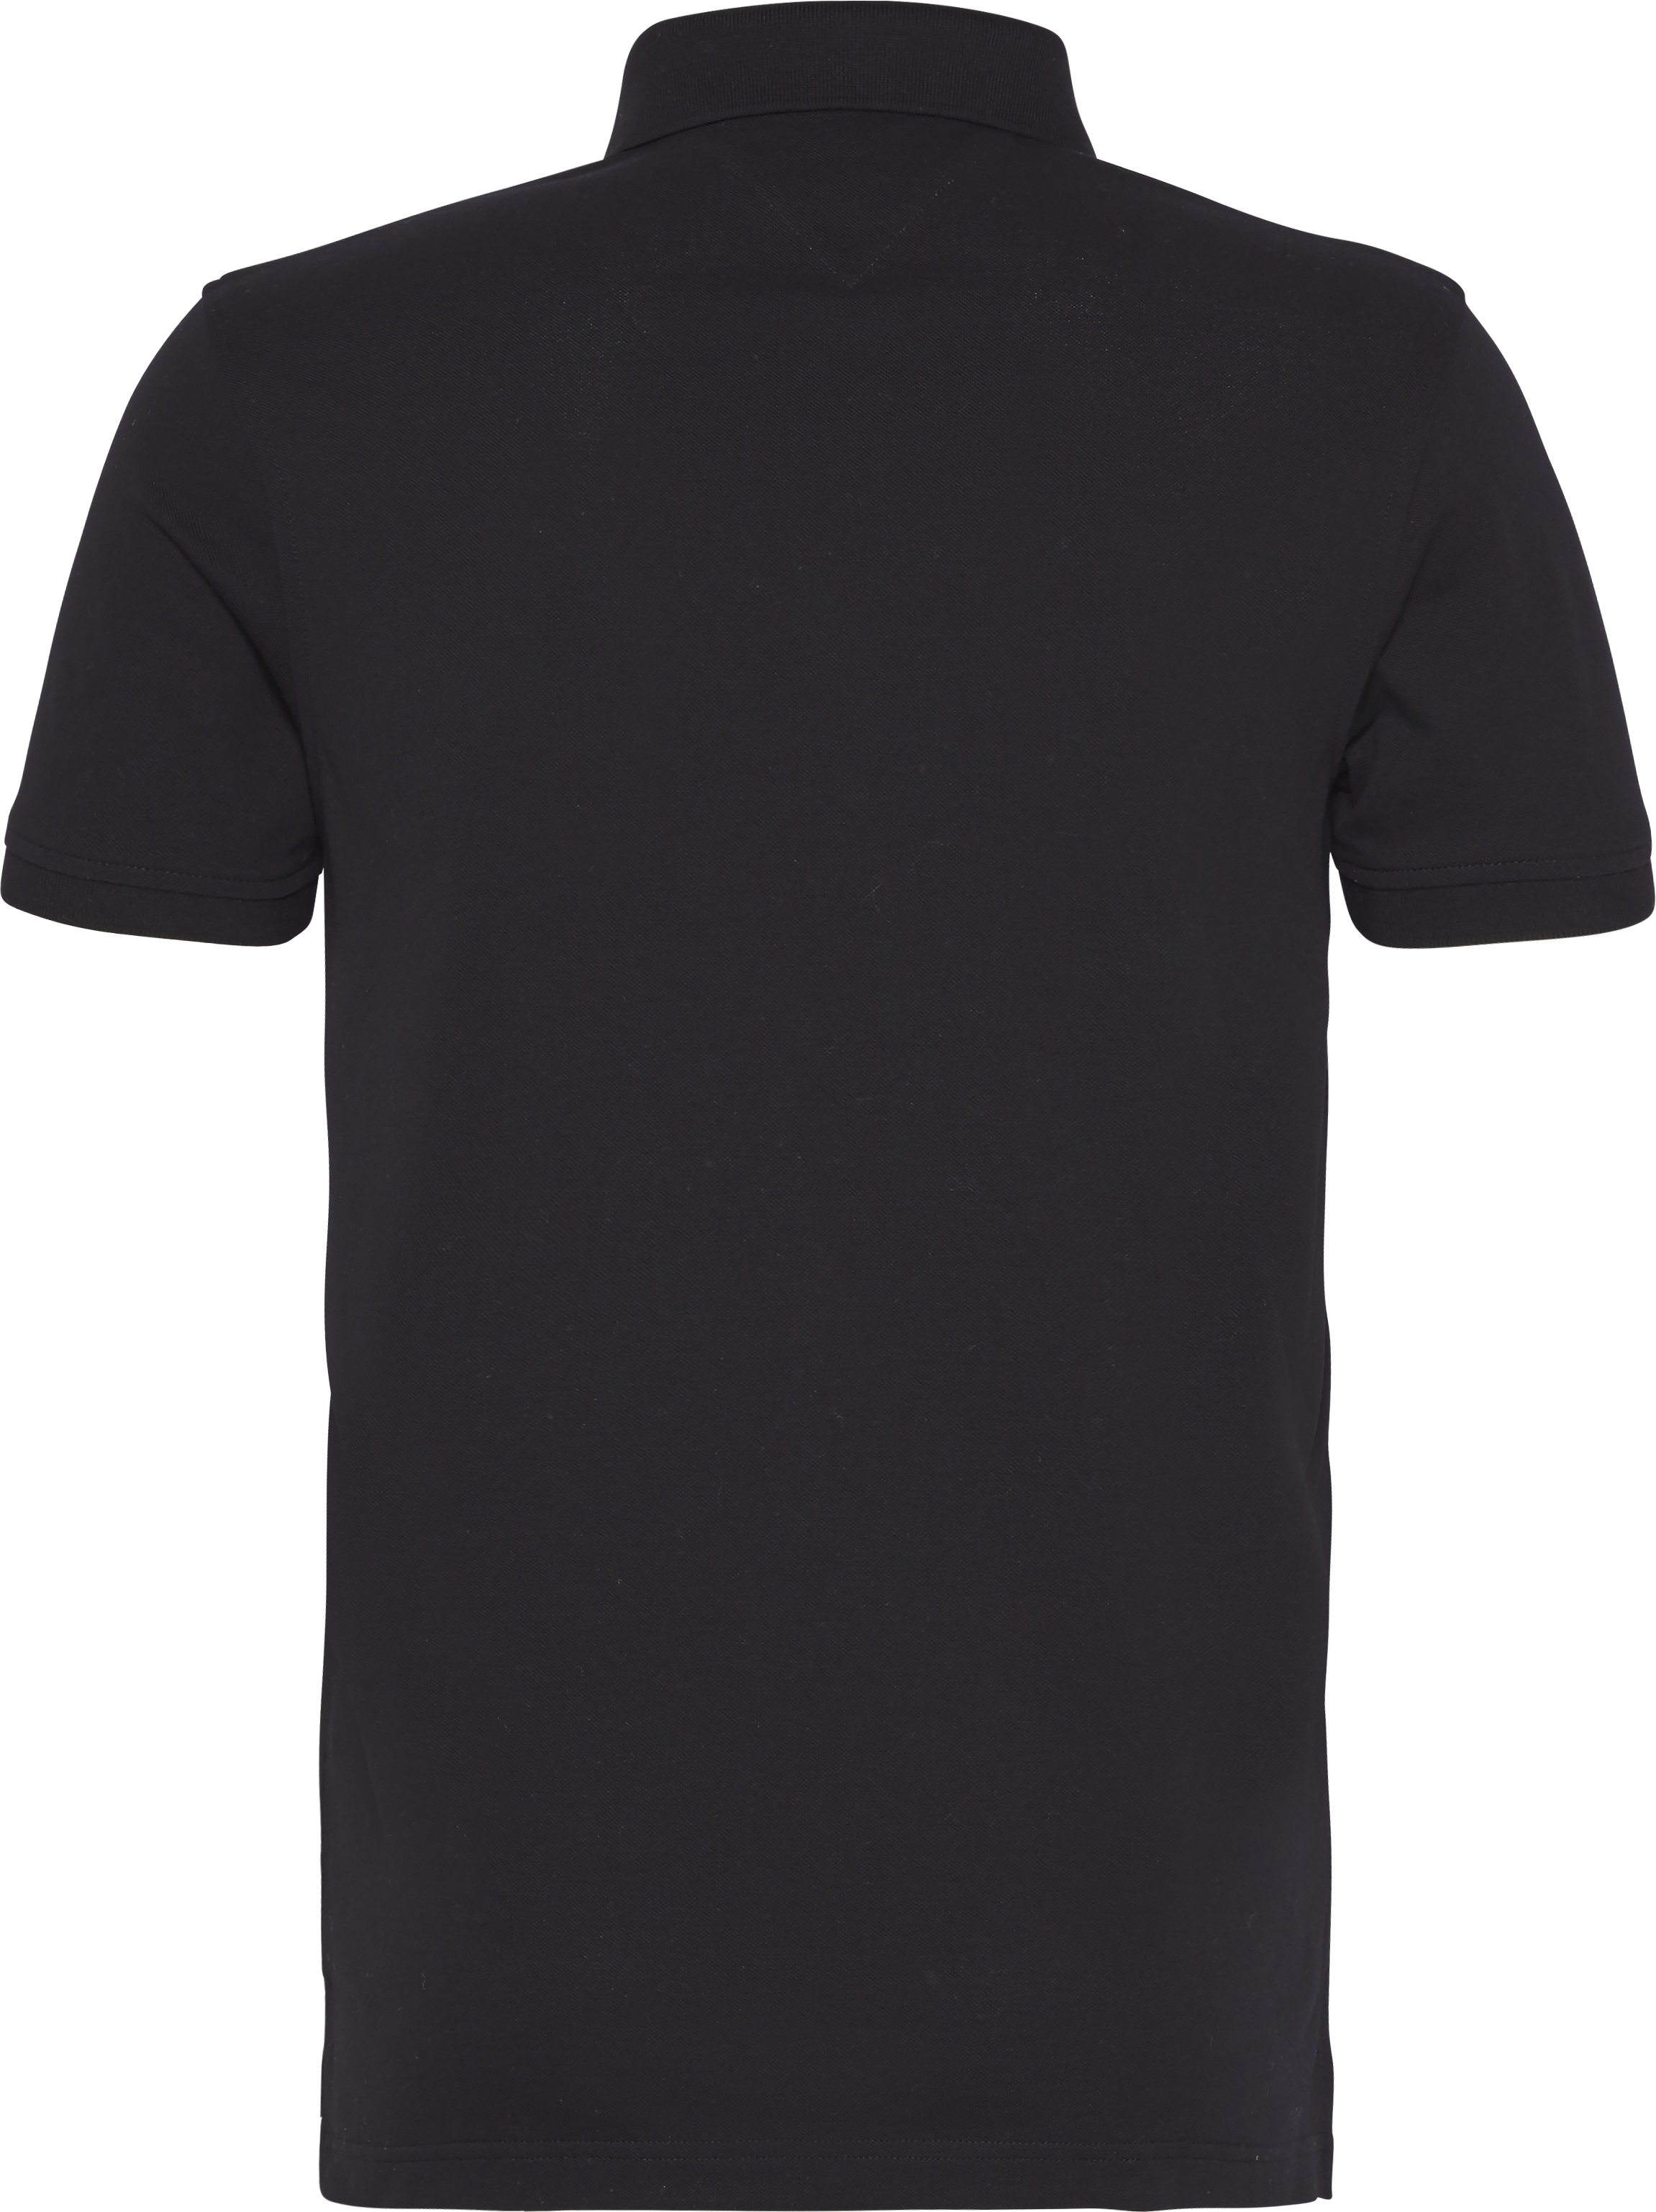 Tommy Hilfiger Core Modern Slim Men's Polo Shirt